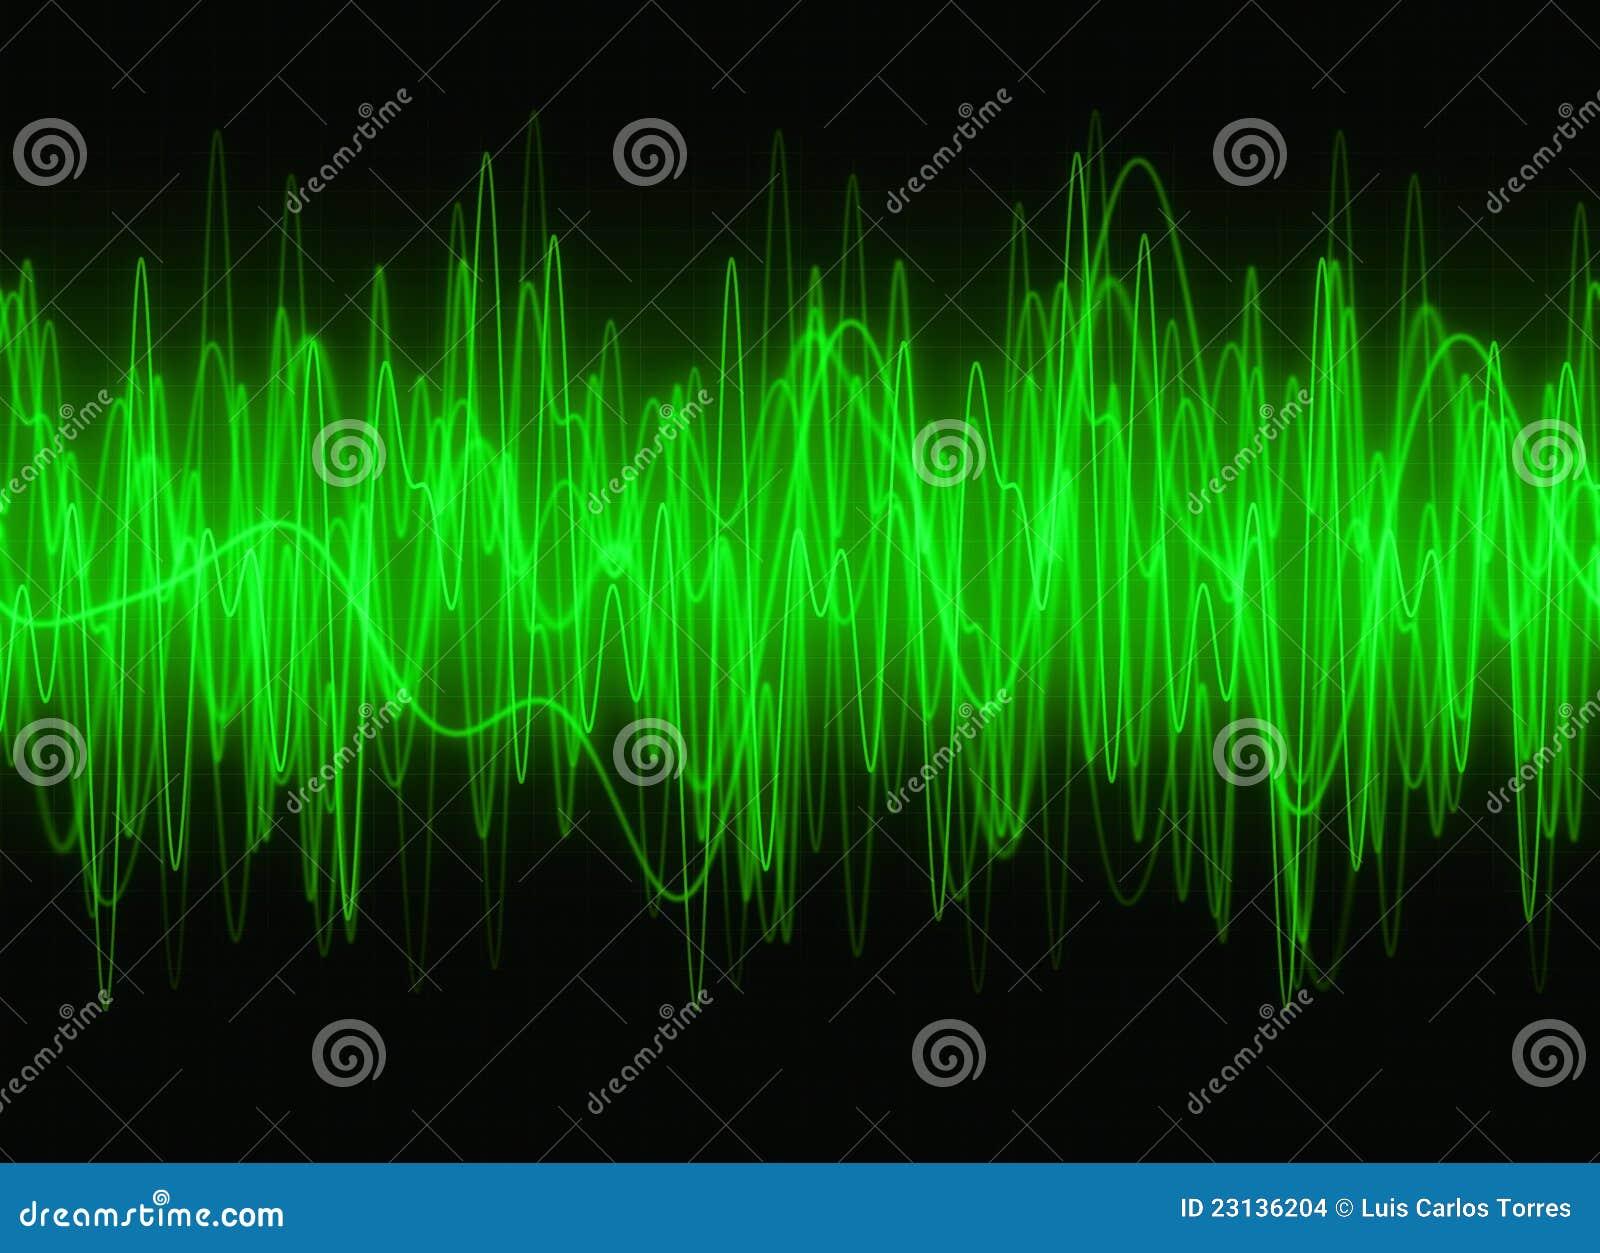 Graphic sound waves